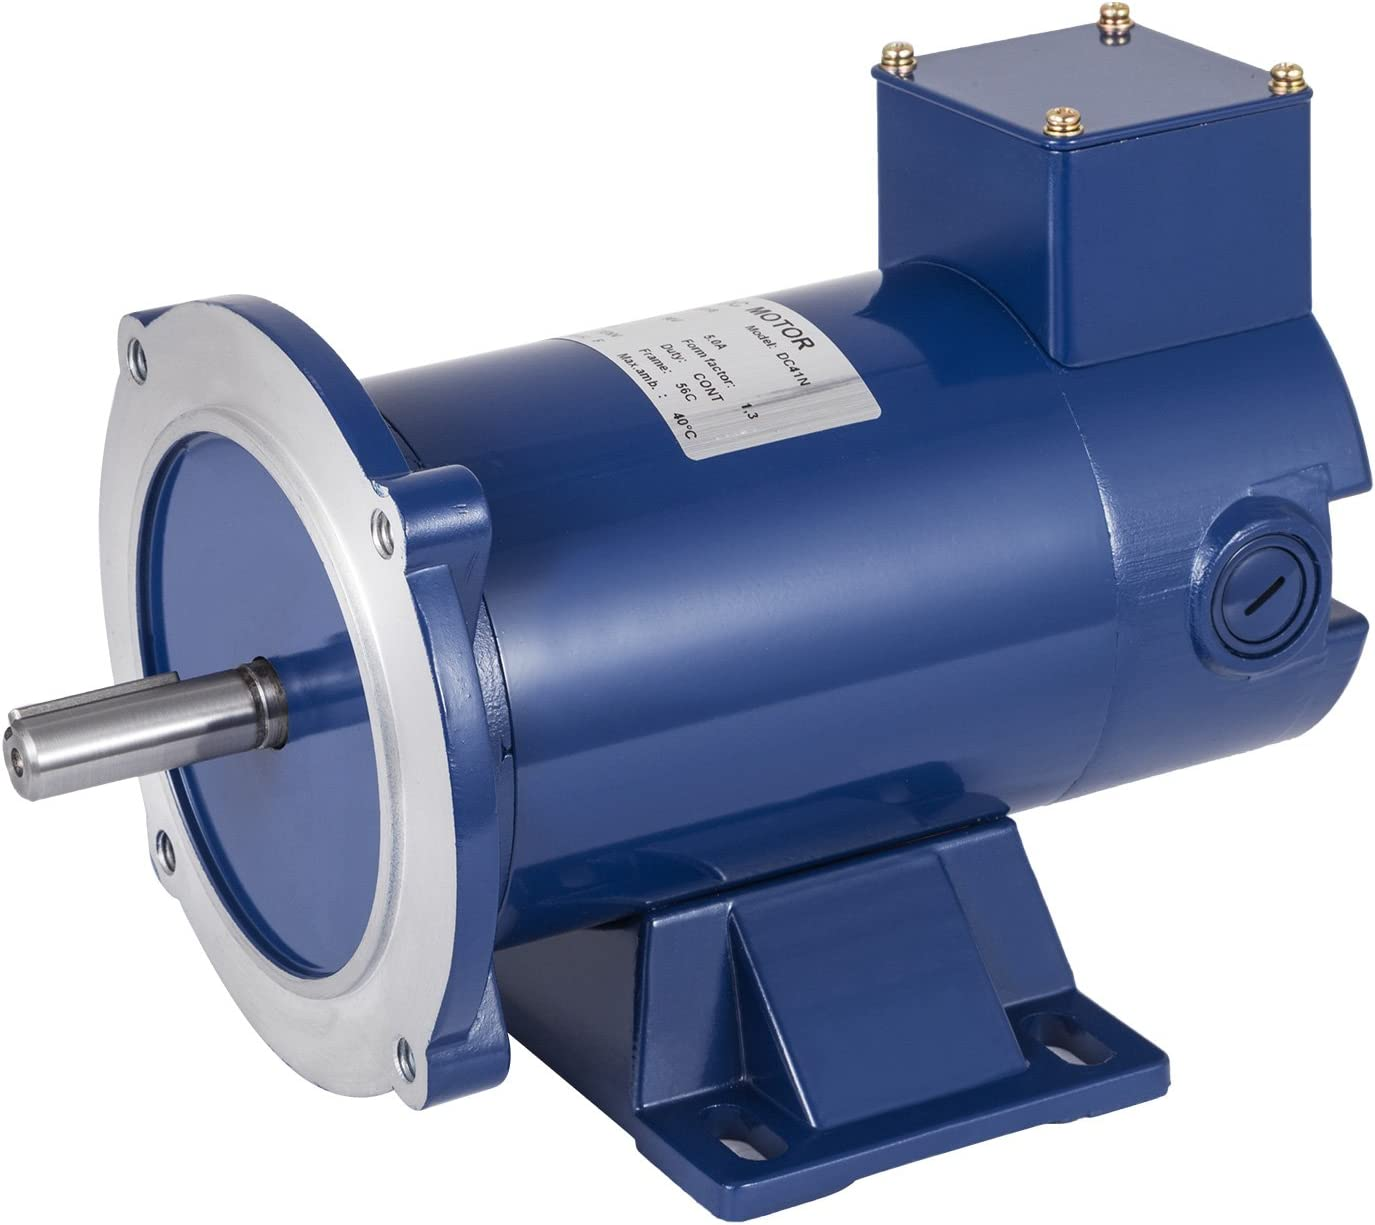 DC MOTOR 1//4~3 HP 56C Frame 1750RPM TEFC MAGNET Permanent Dominate Generally